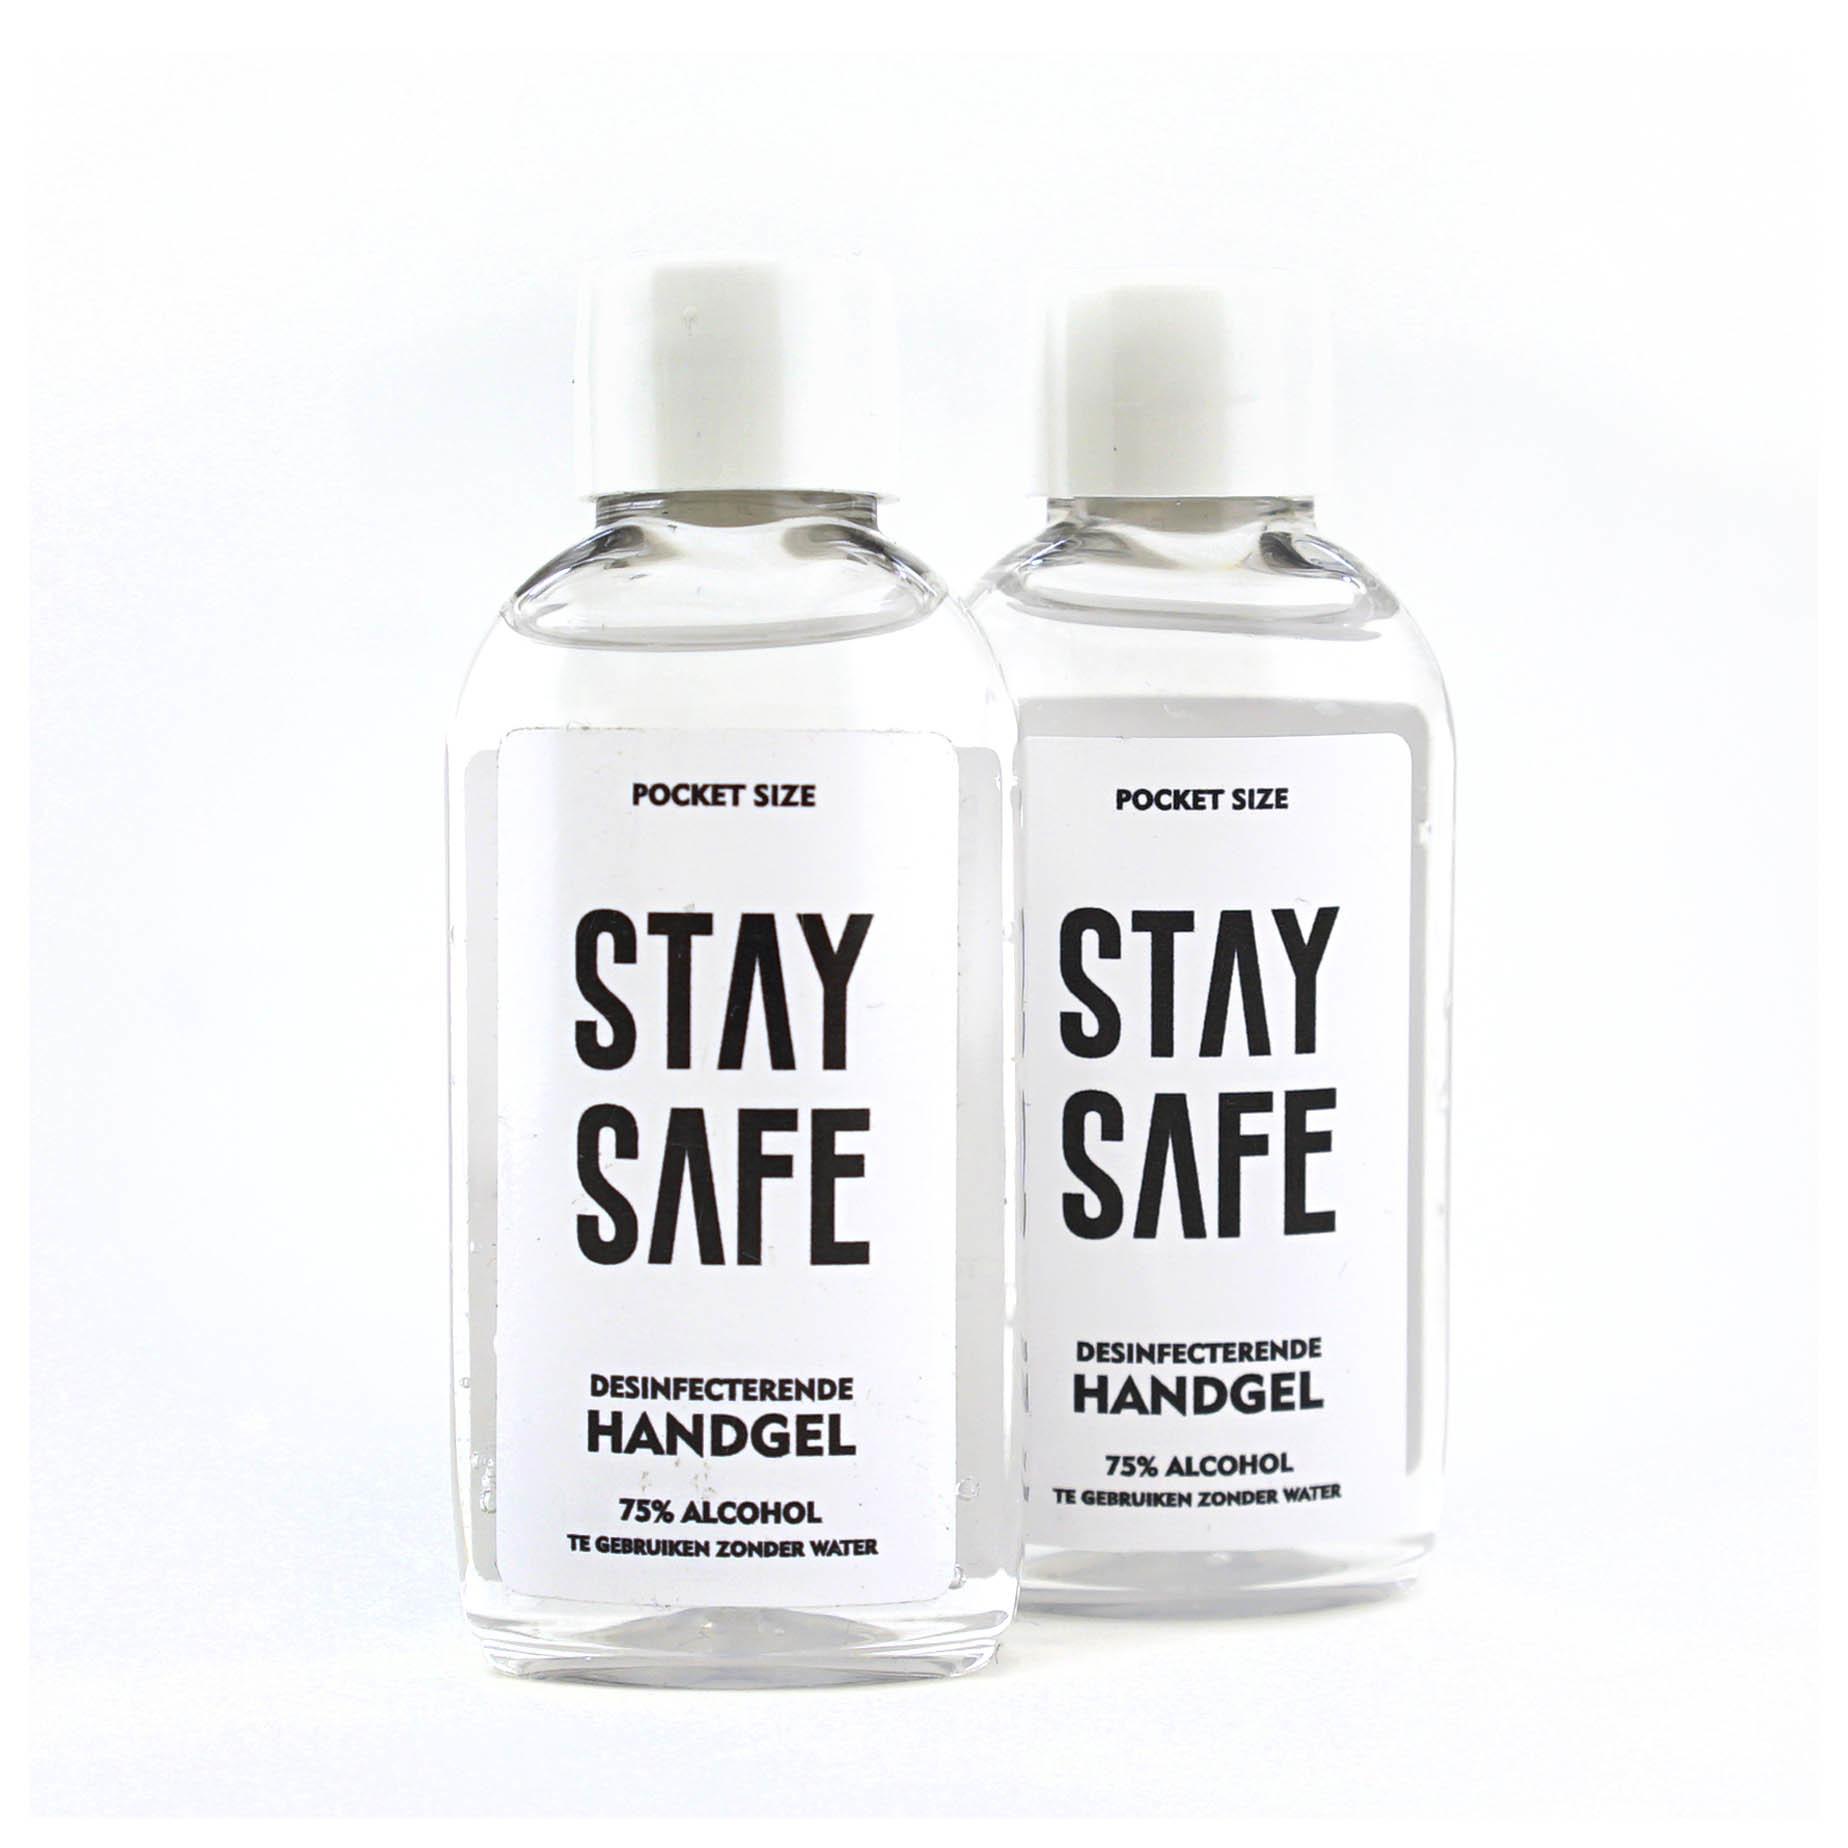 Topfanz Duopack alcoolgel de poche - Stay Safe